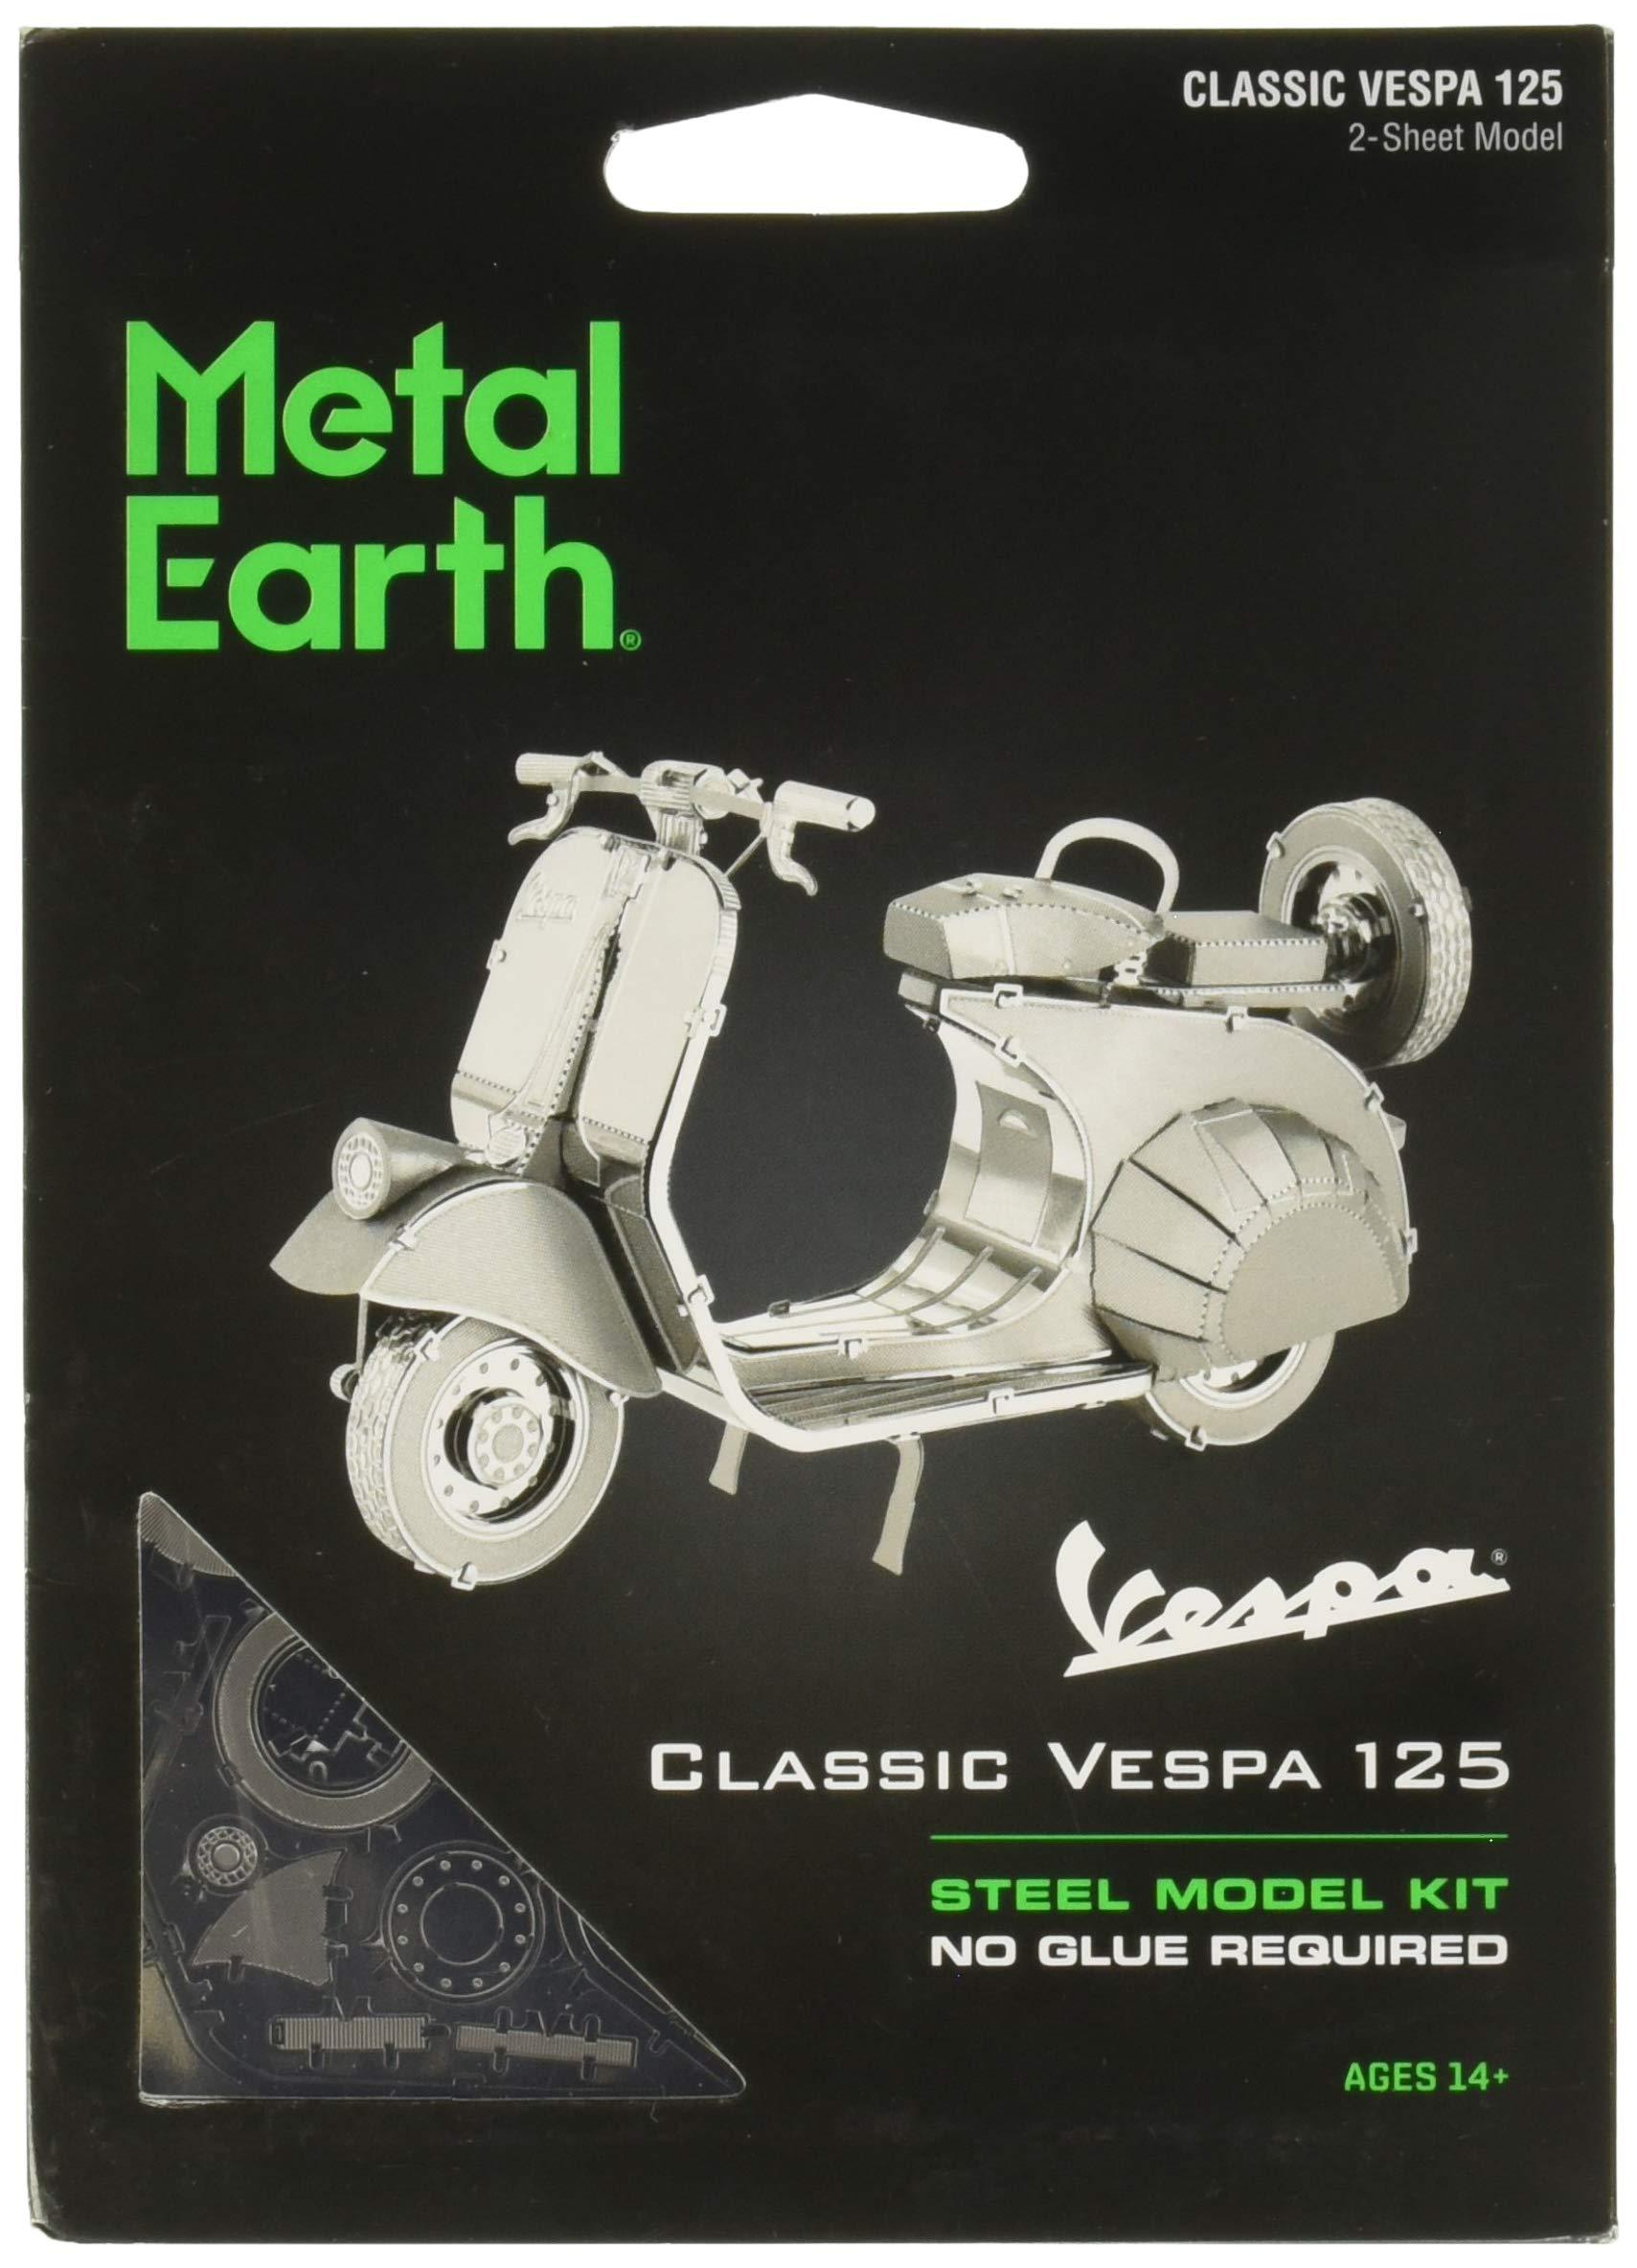 Fascinations Metal Earth Classic Vespa 125 3D Metal Model Kit